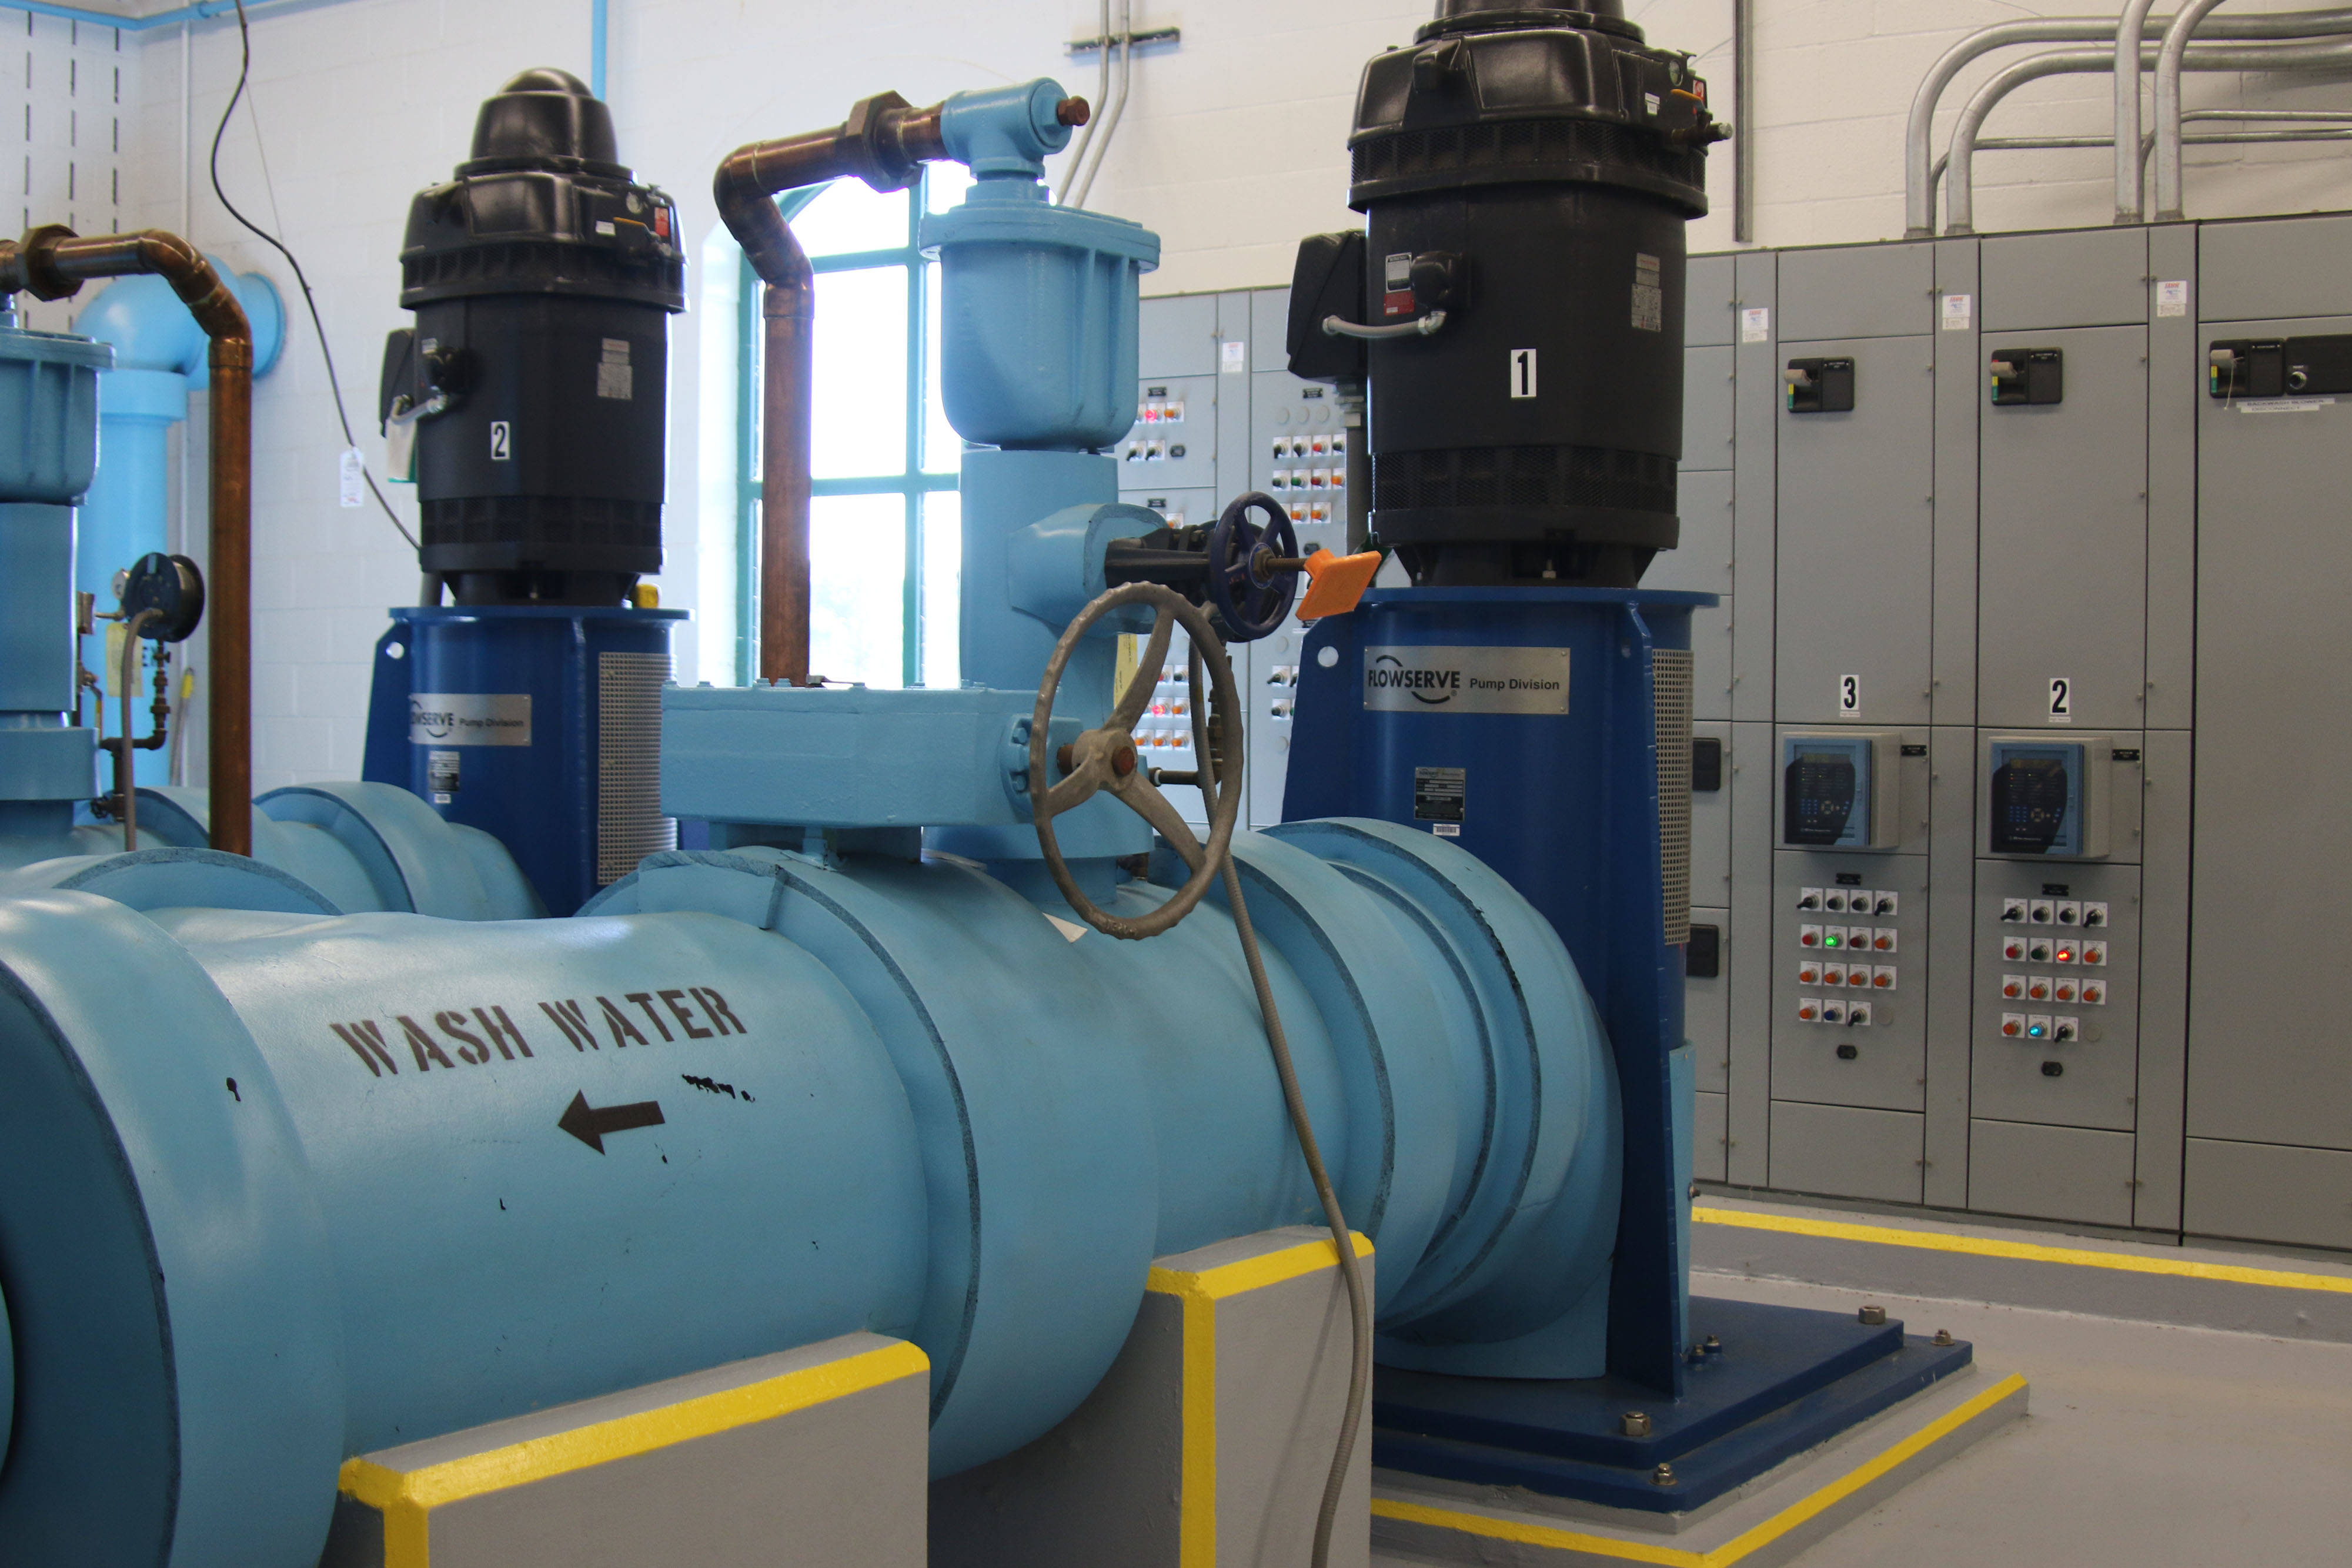 bdcd2f3abb3fd5acbb79_Olean_filtration_plant_1.jpg